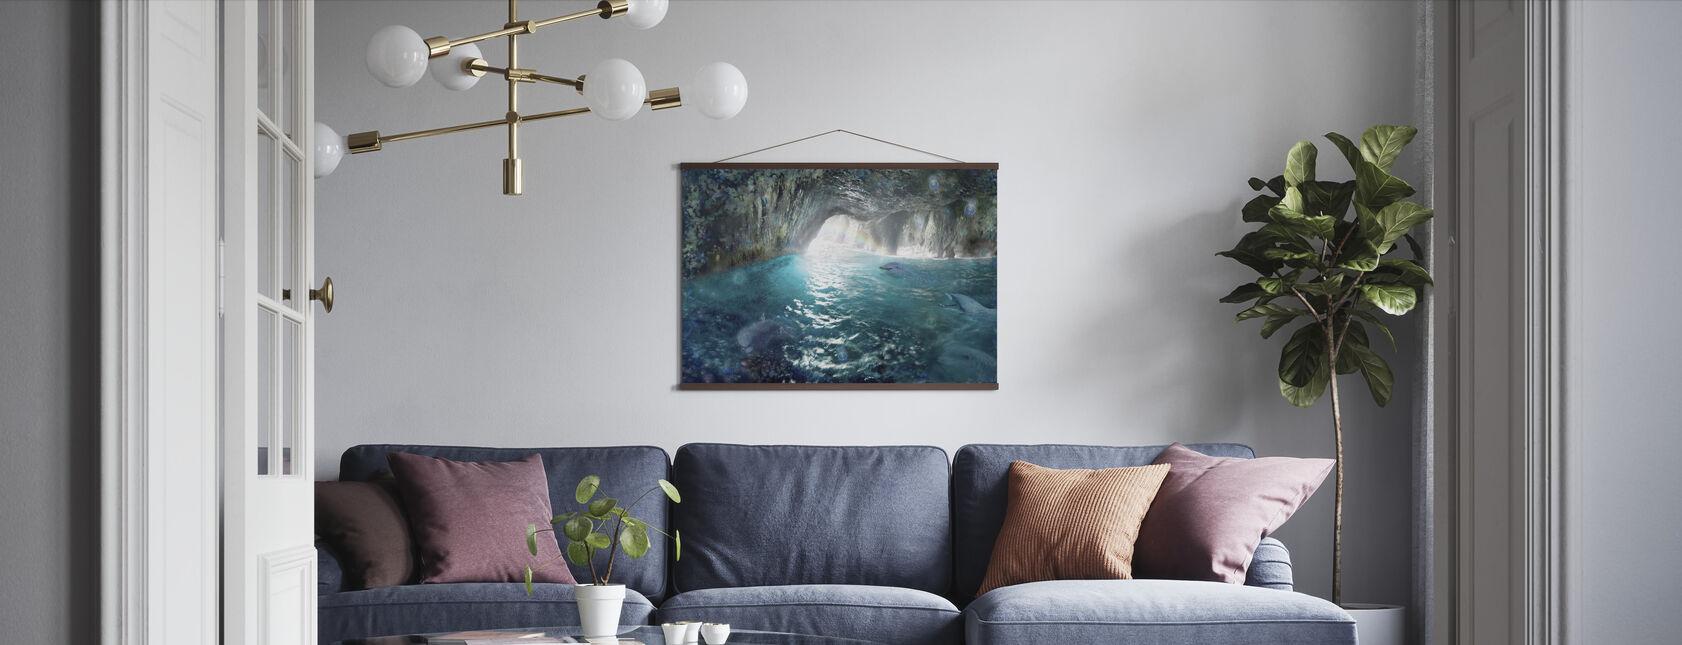 Delfin Seacave - Poster - Vardagsrum